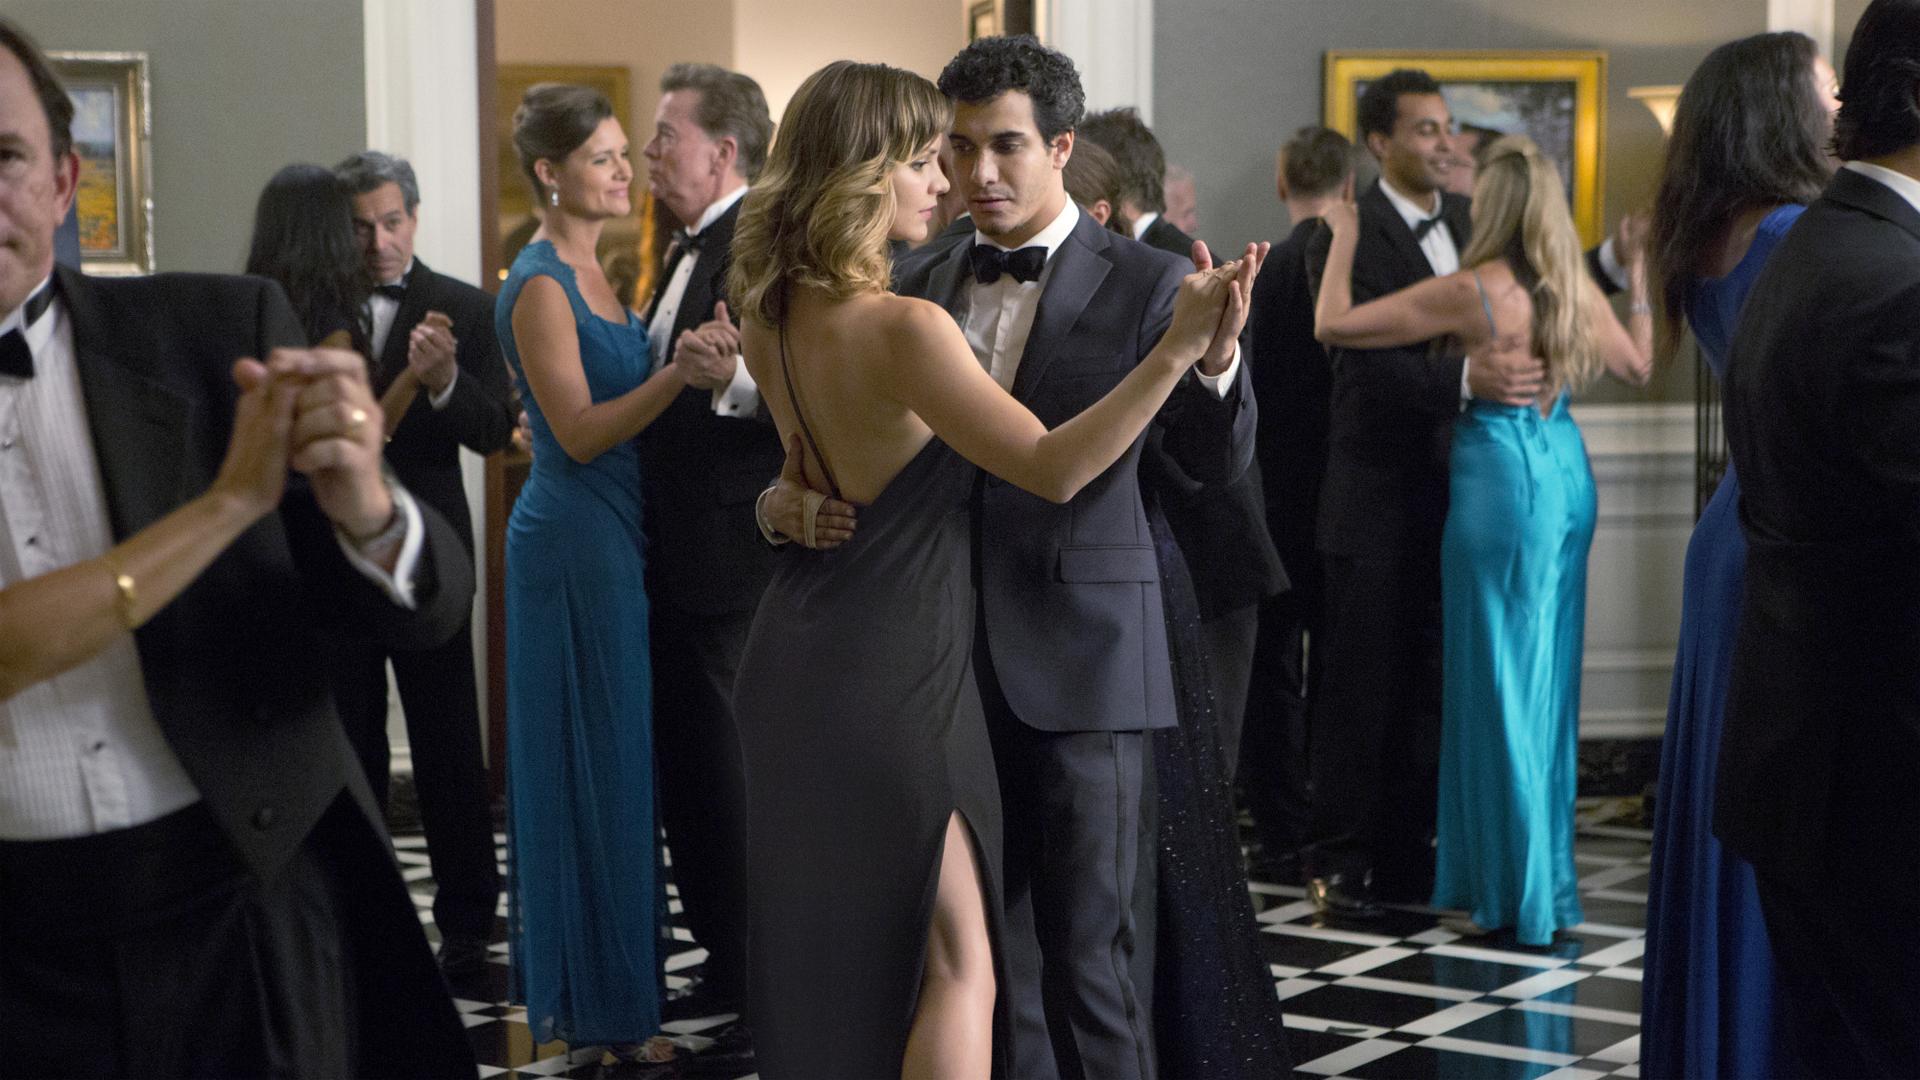 Watch Scorpion Season 1 Episode 6: True Colors - Full show on CBS All Access